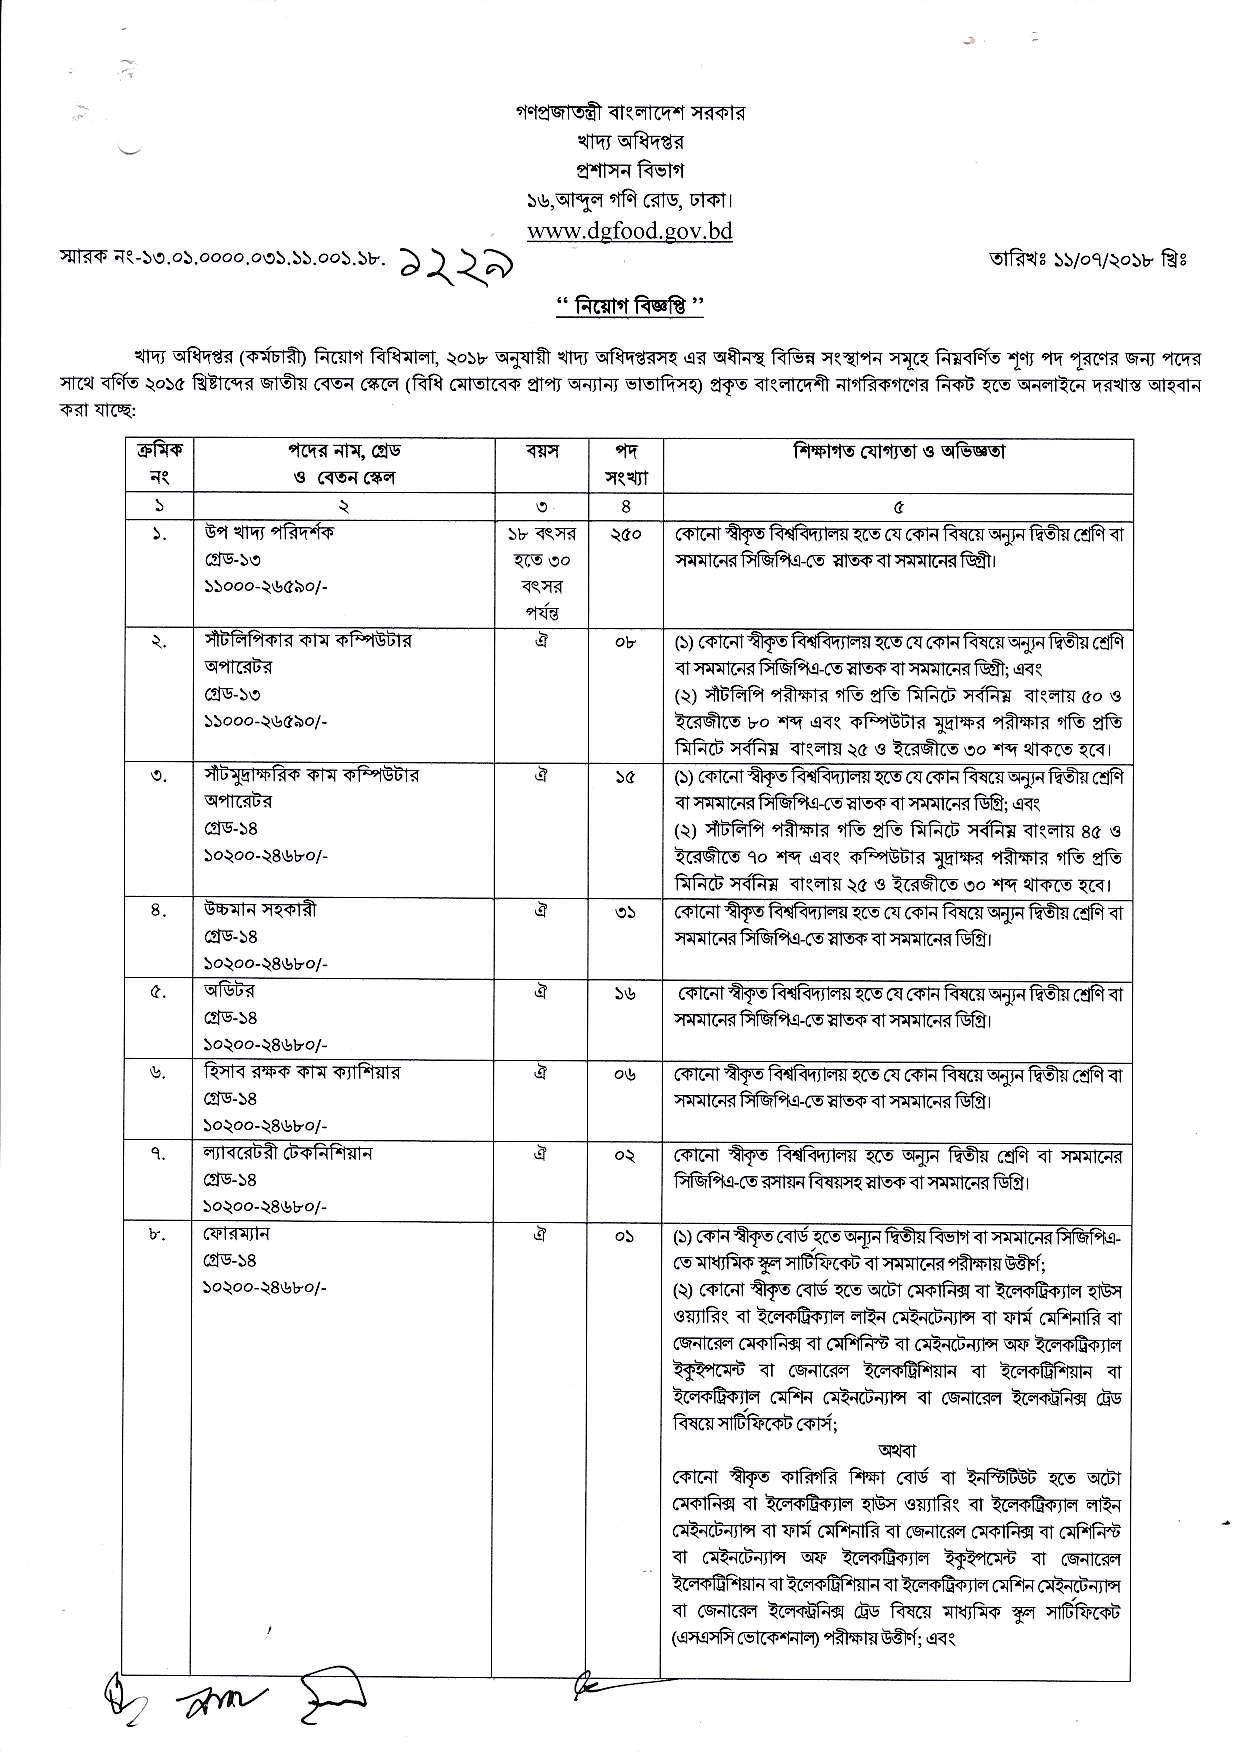 Pin on Government / Govt jobs circular in Bangladesh